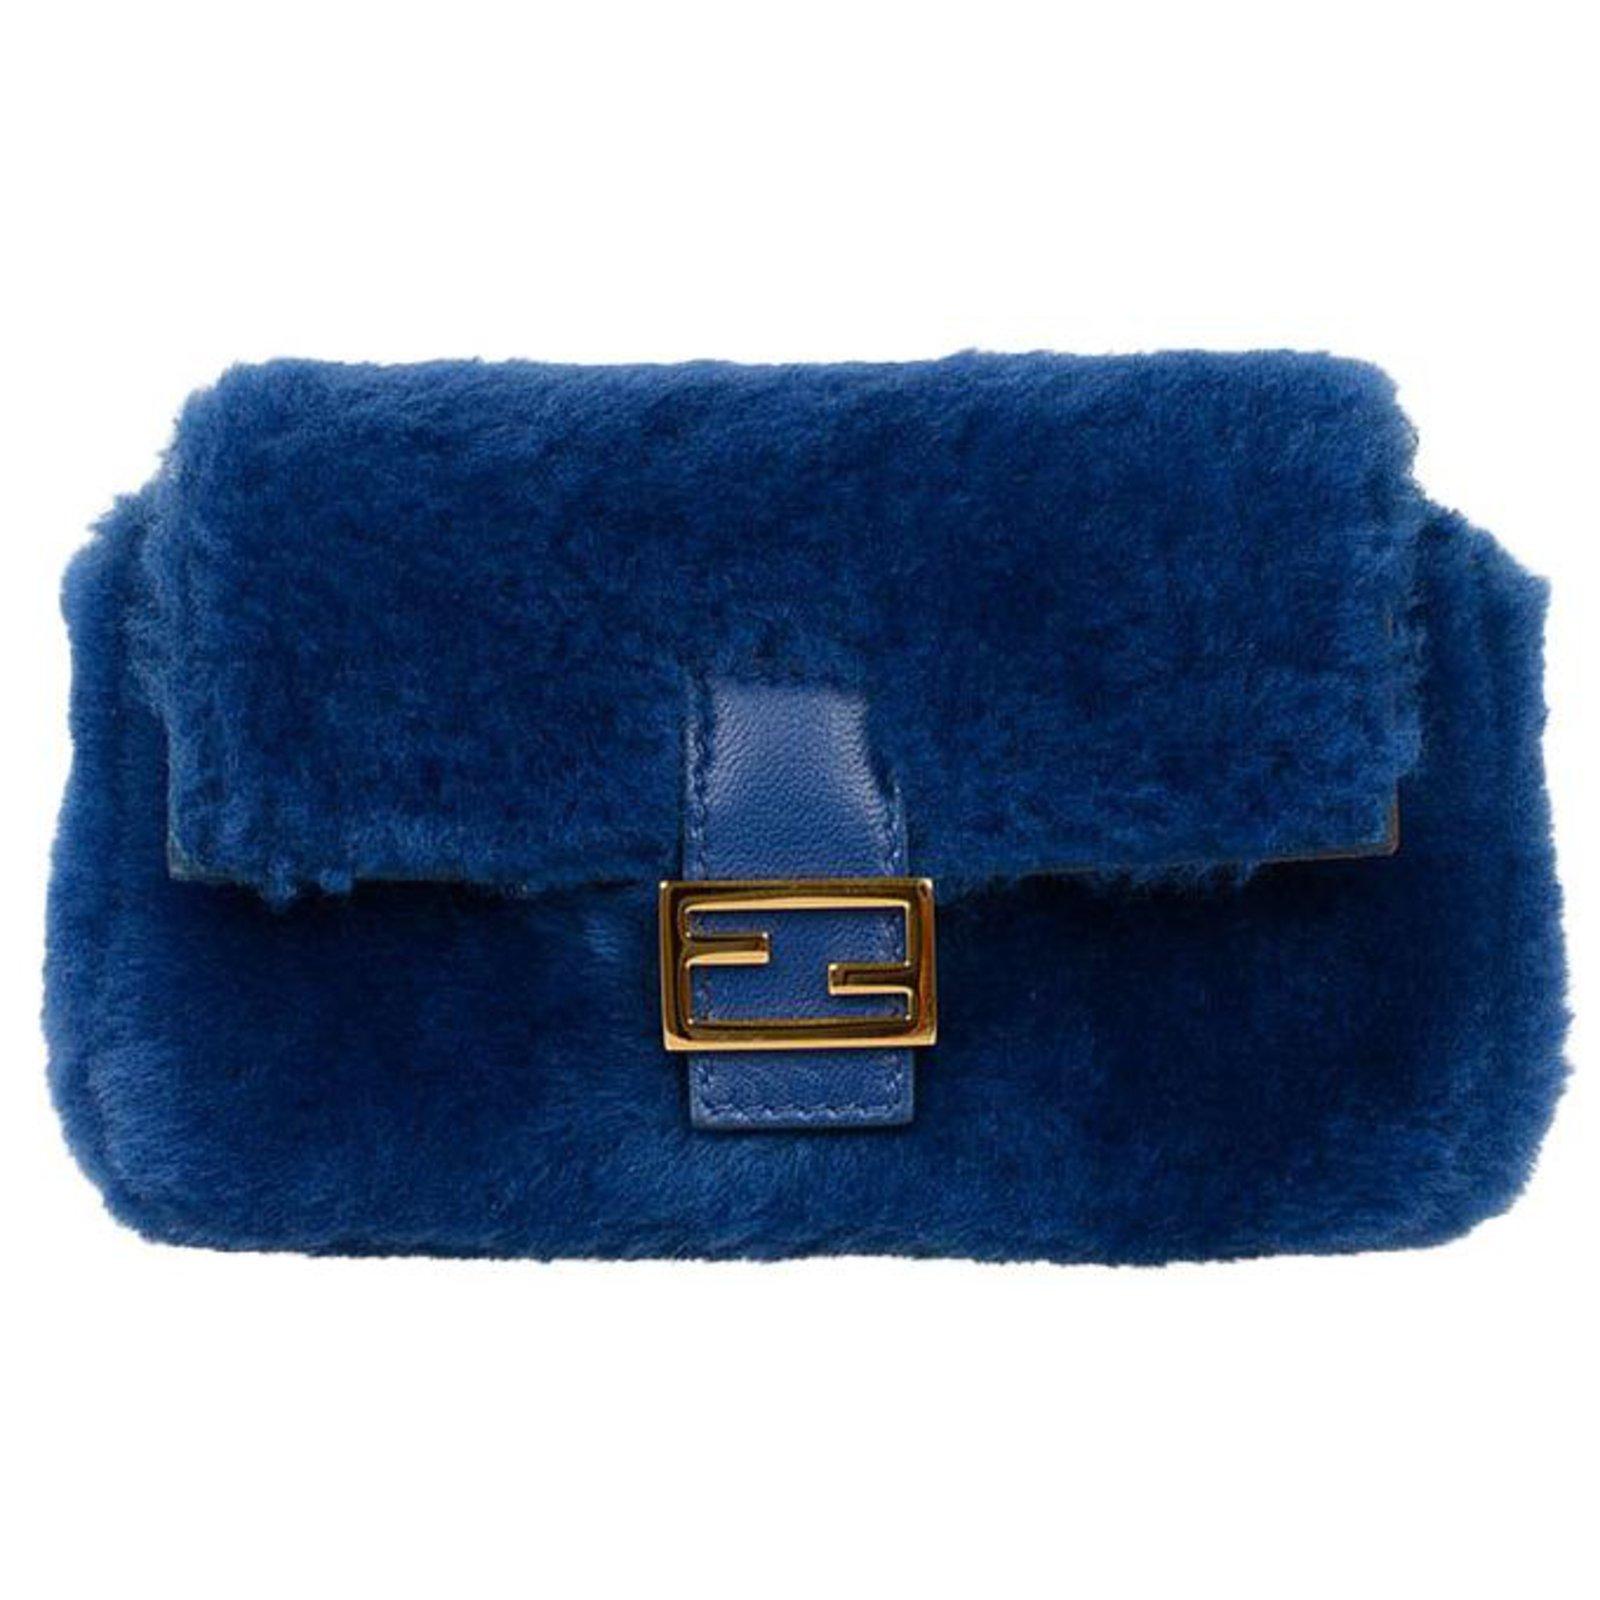 Fendi Handbag Handbags Fur Blue ref.77980 - Joli Closet